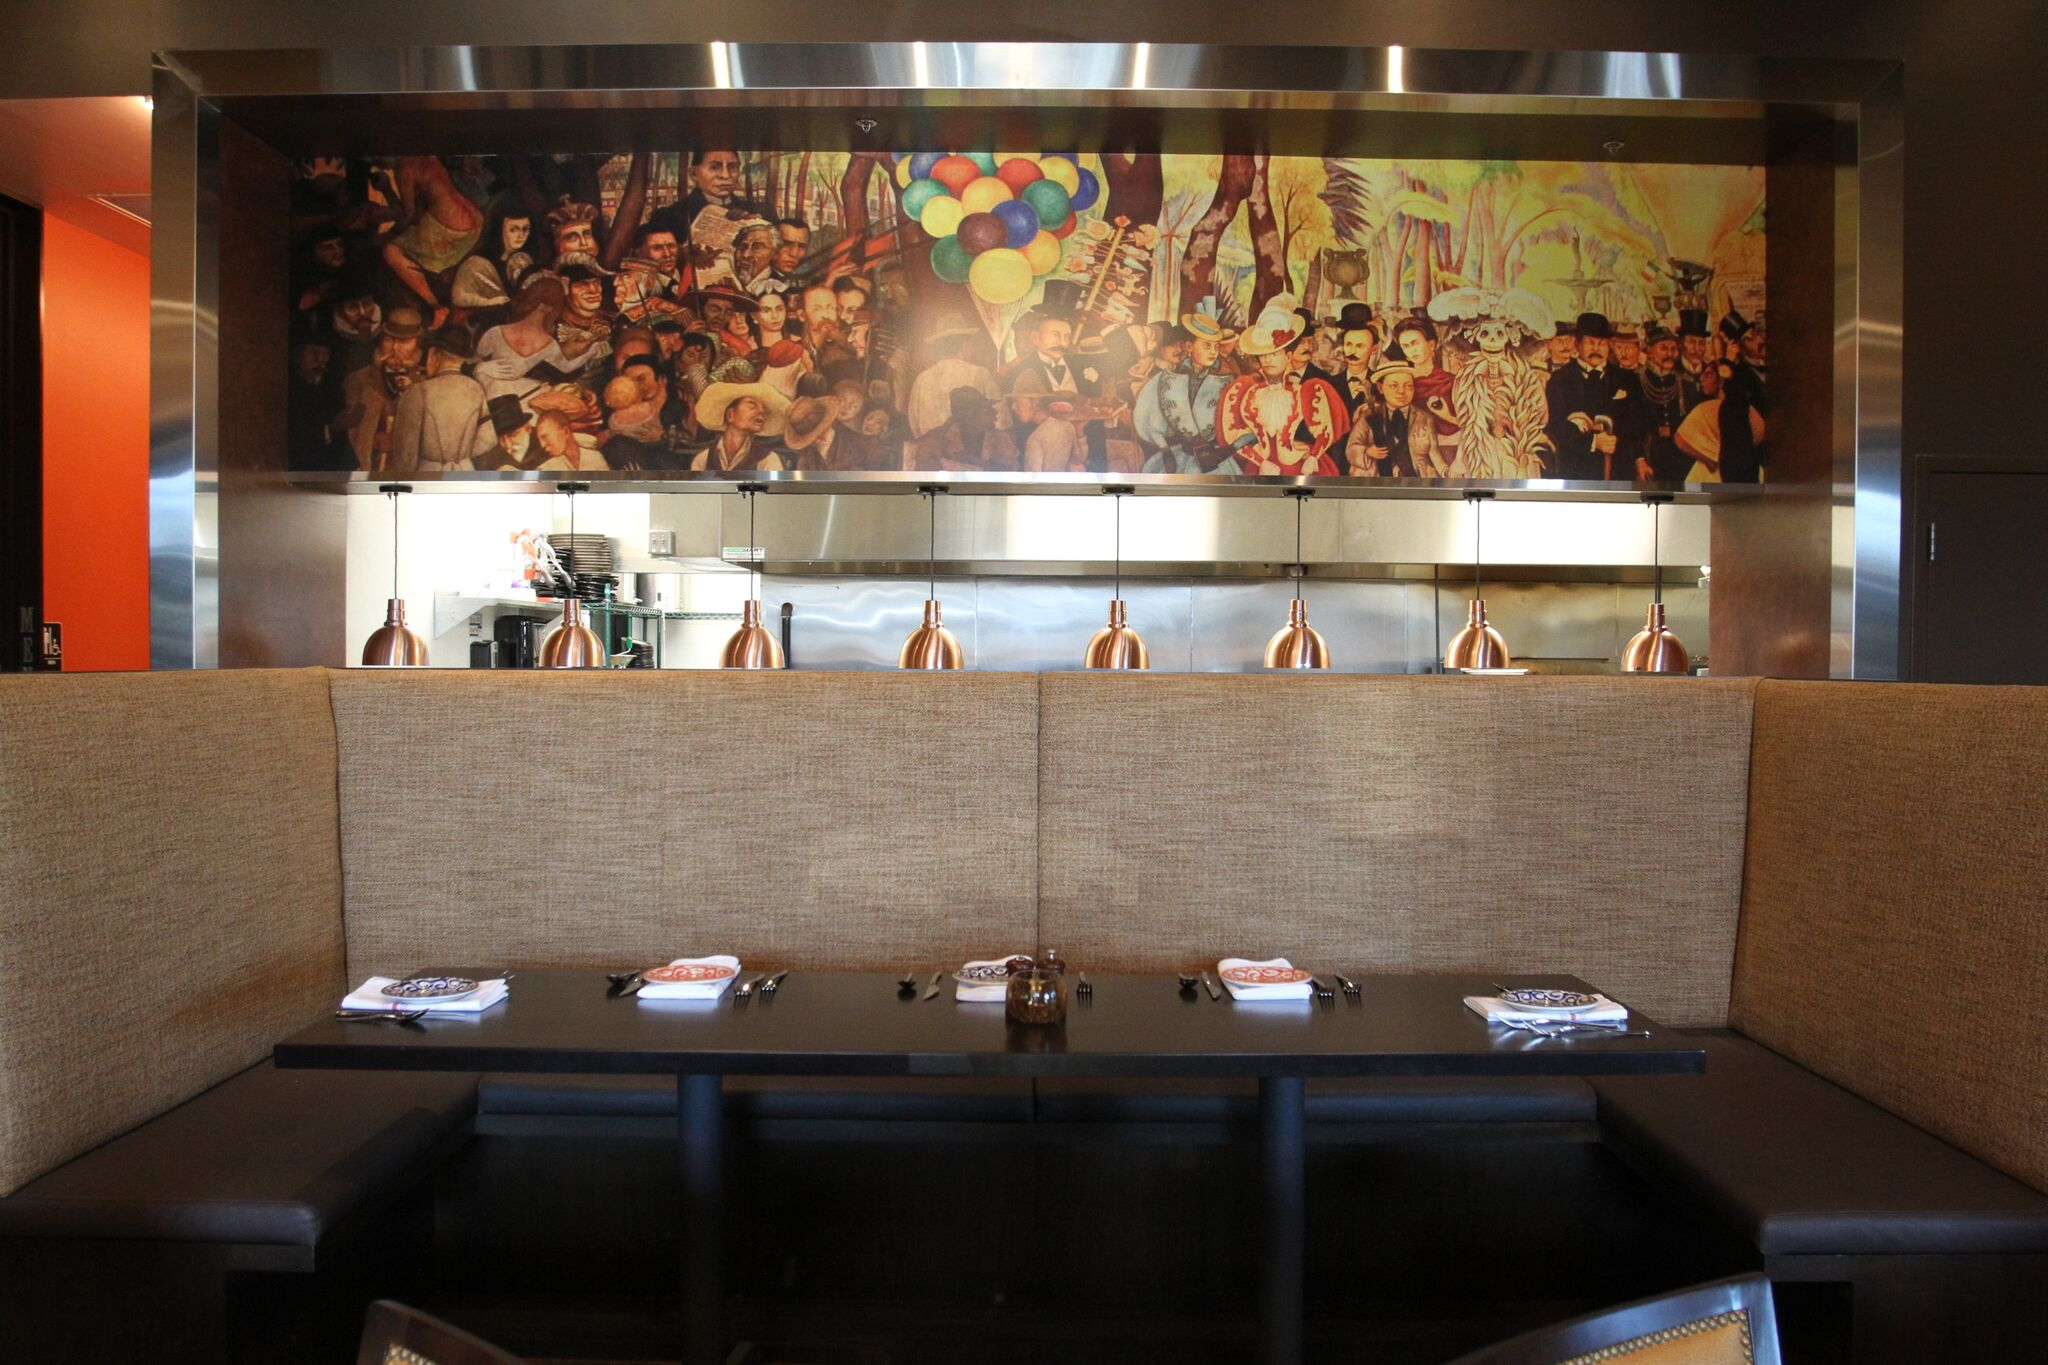 BRUNCH MENU for West Des Moines Restaurant Blu Toro Cantina + Grill Open Kitchen